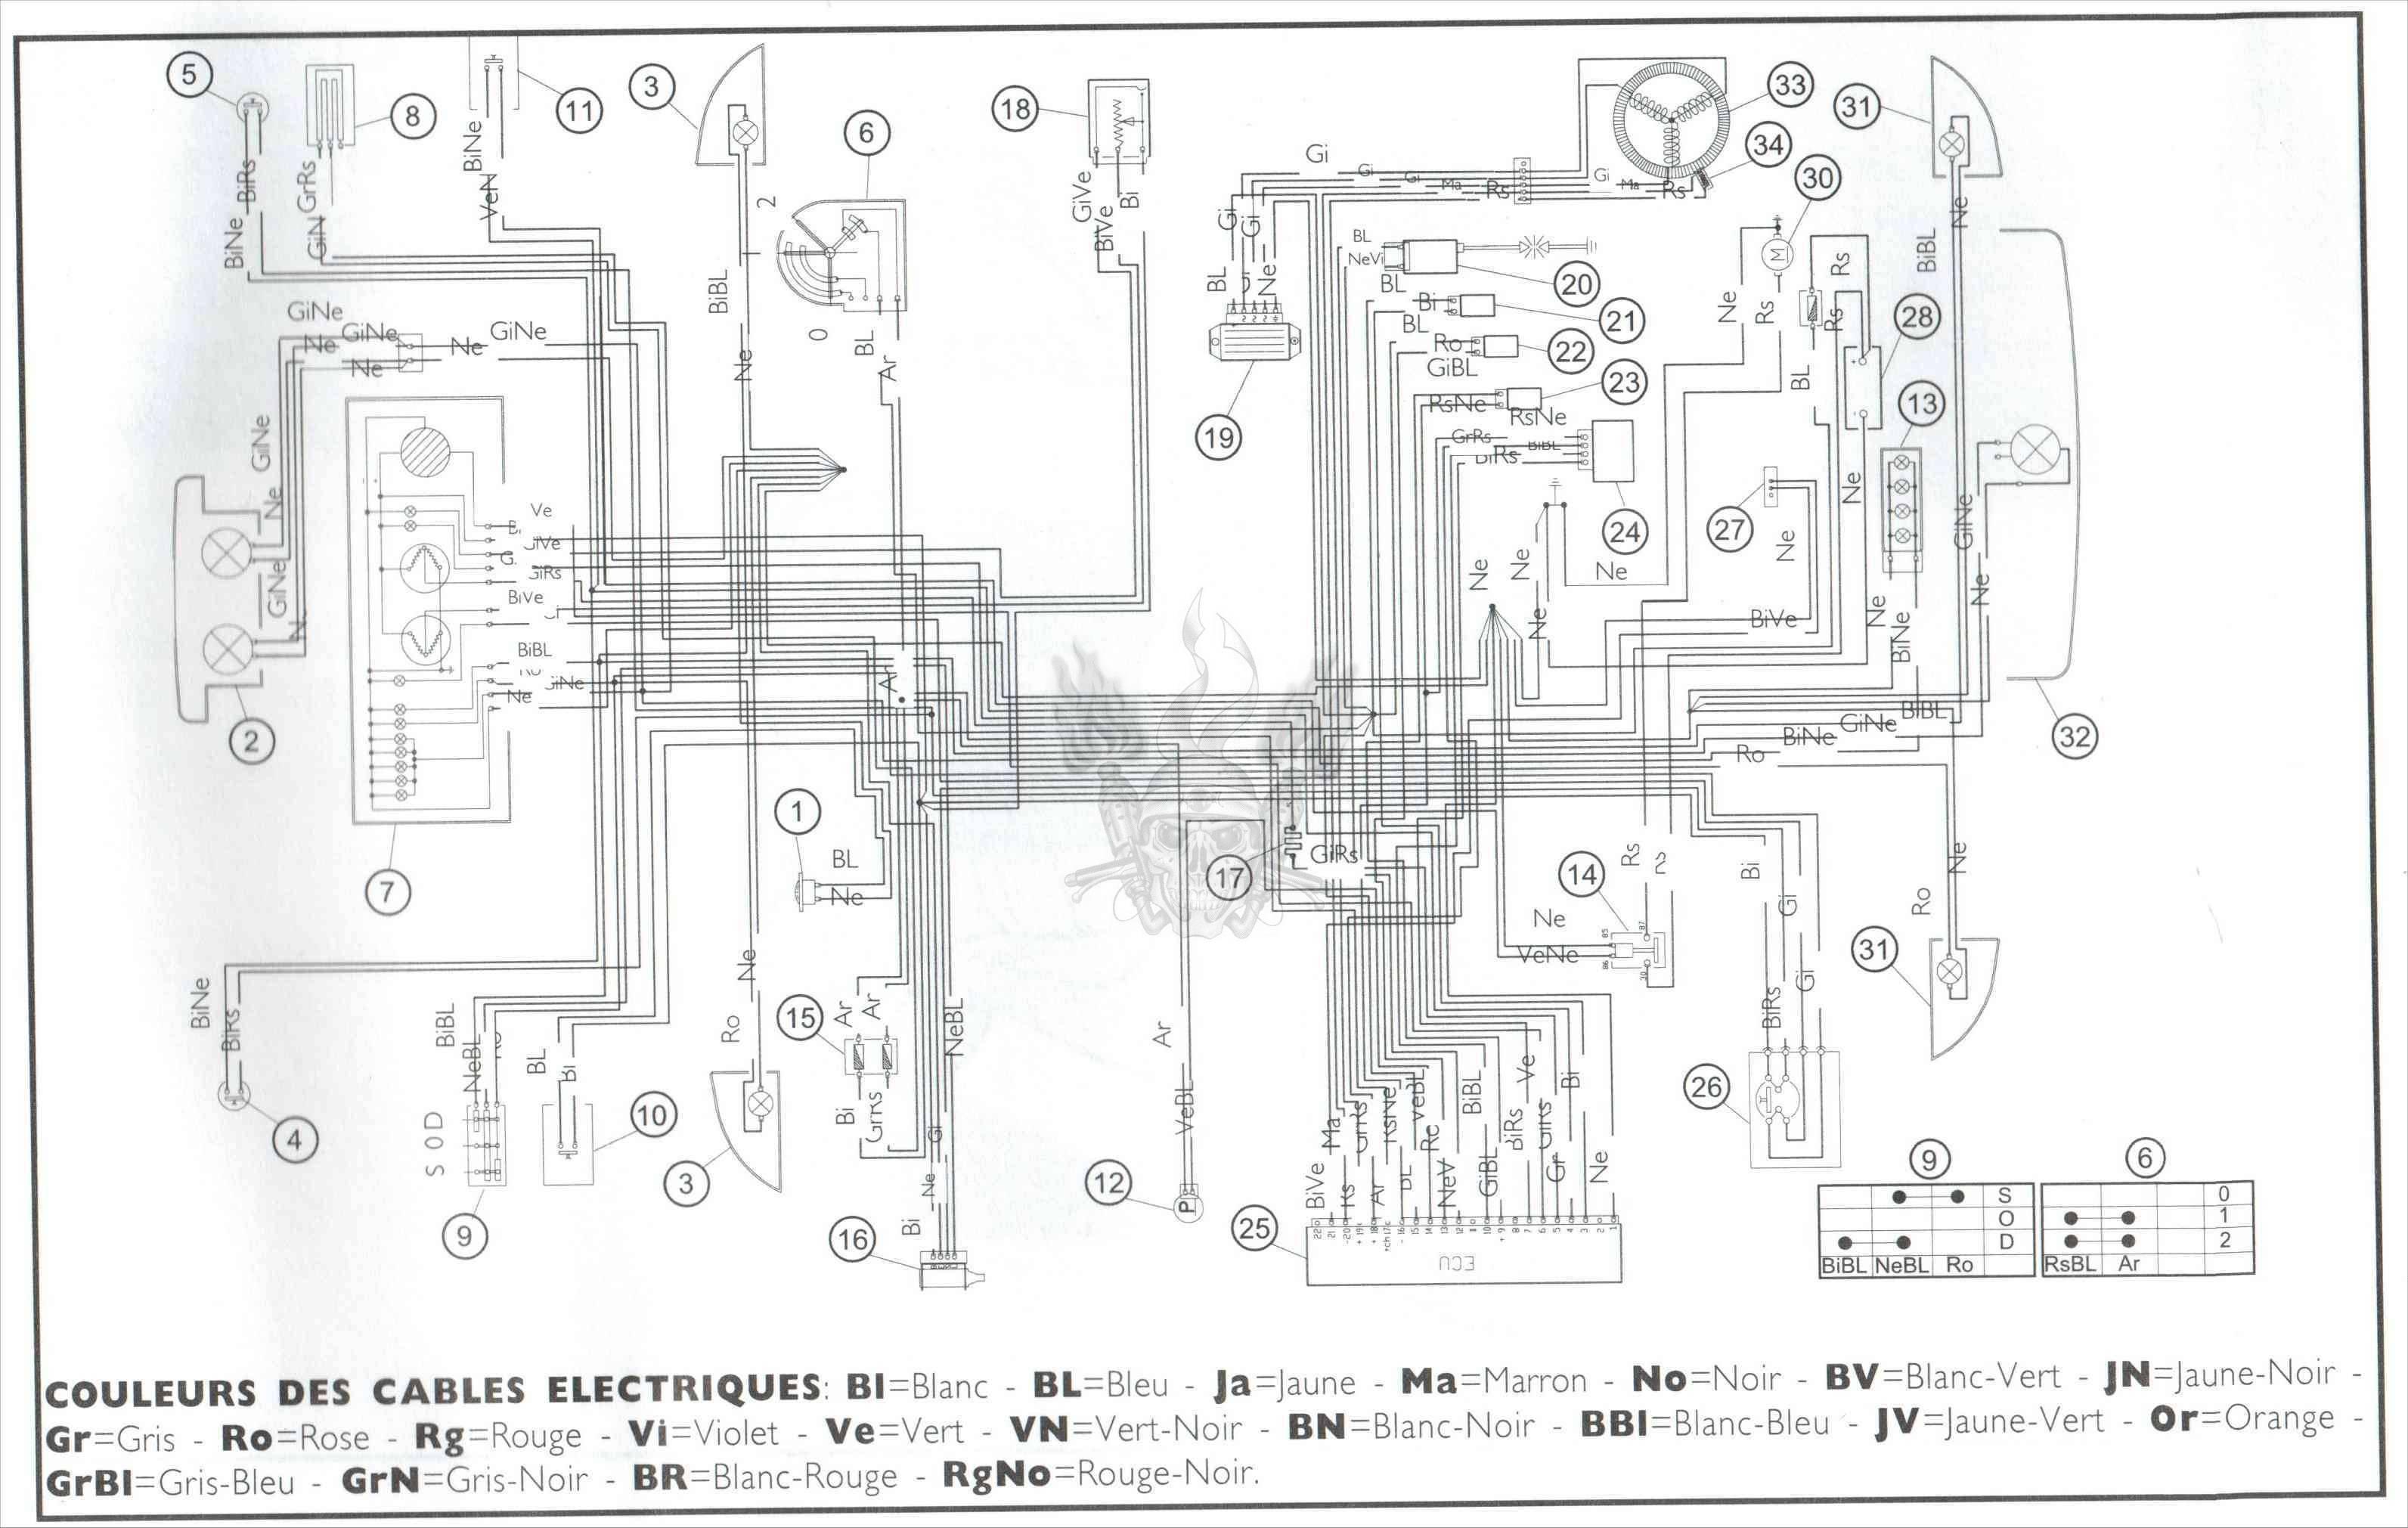 Peugeot Speedfight 2 Wiring Diagram Free For You Cf Moto Utv Z Force 600 100cc Exhaust